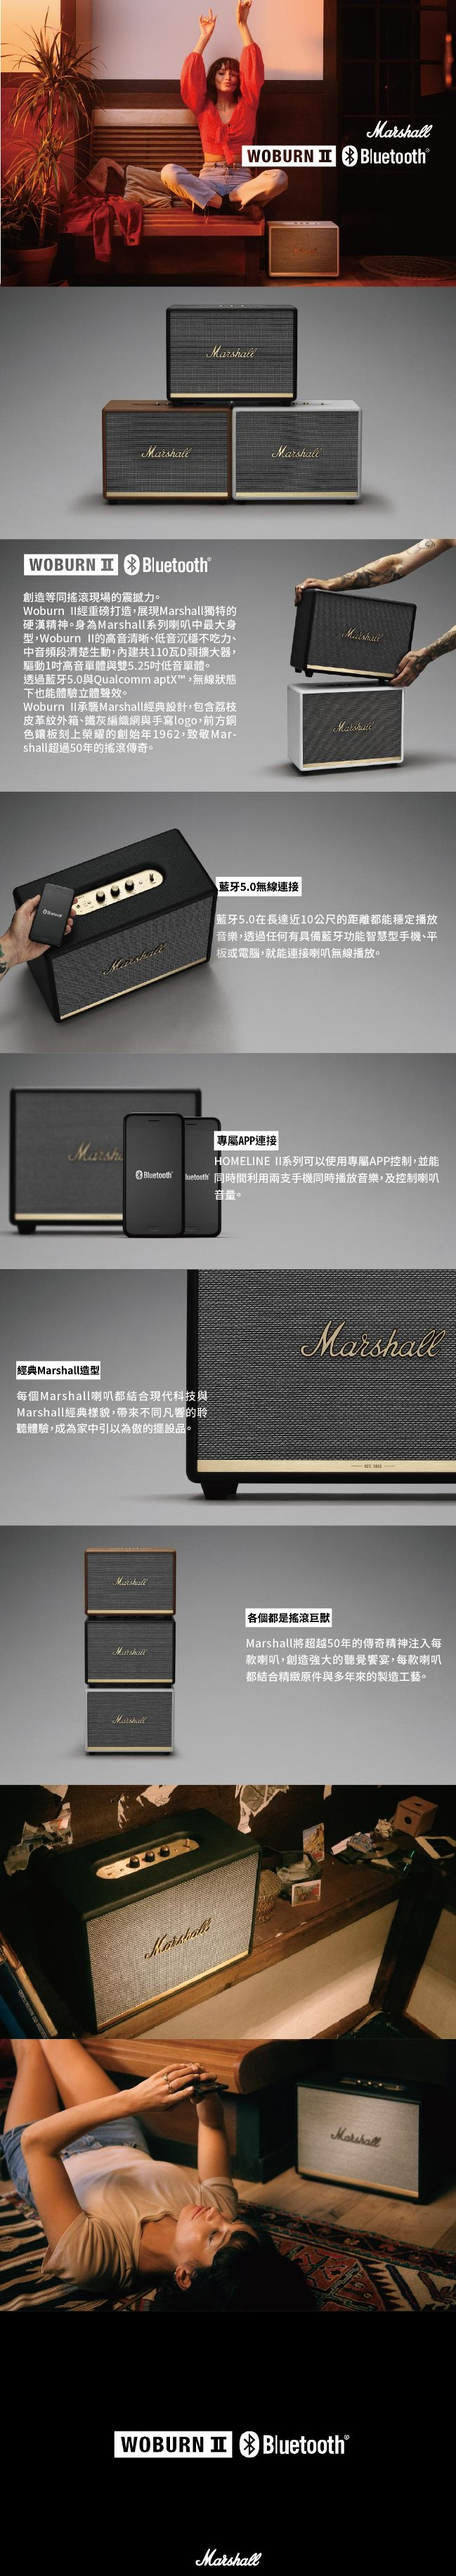 (複製)Marshall|Woburn II 藍牙喇叭 - 奶油白